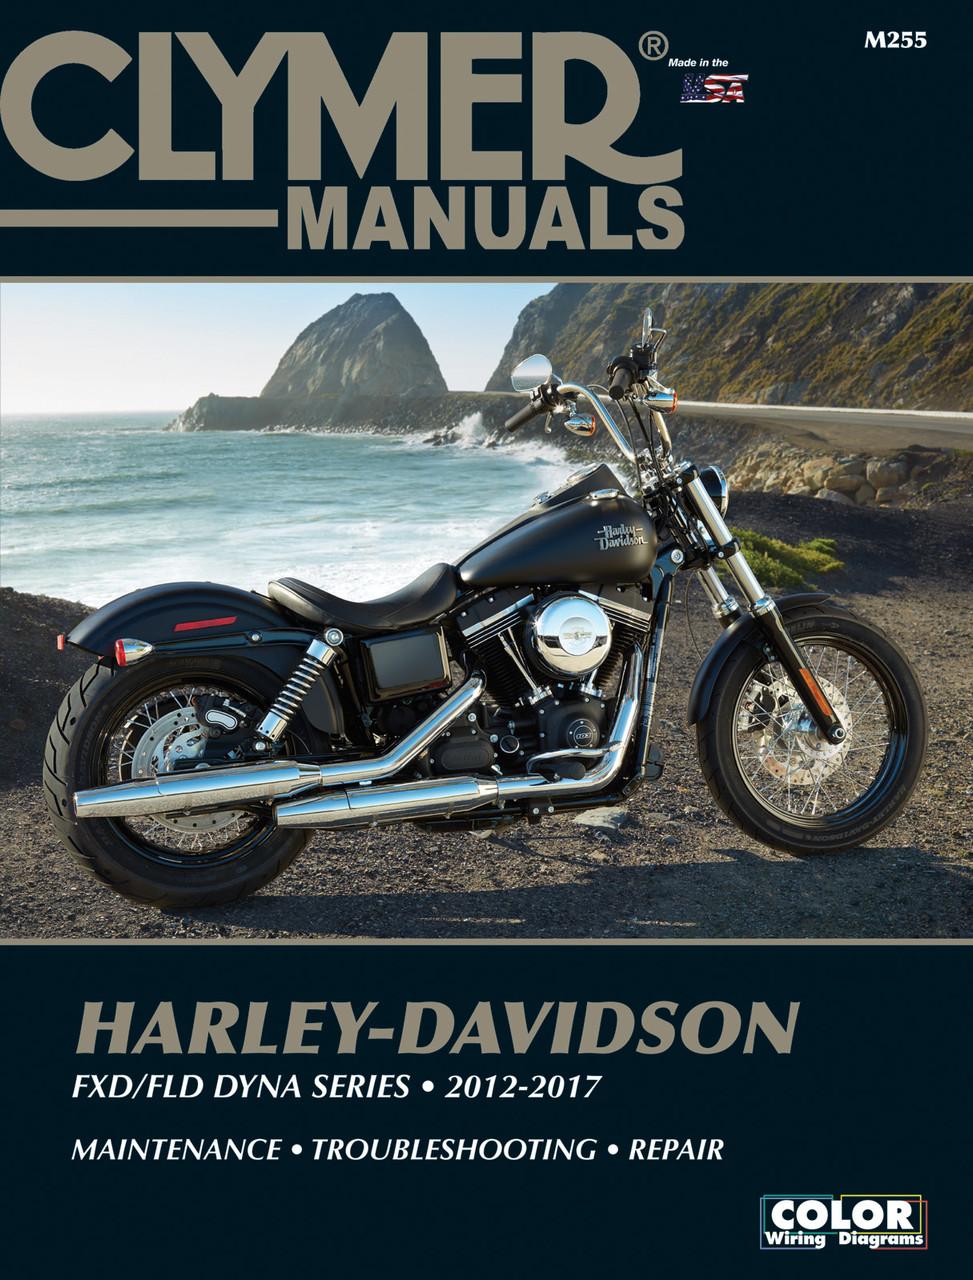 Harley Davidson Fxd Fld Dyna Series 2012 2017 Clymer Repair Manual Ebay